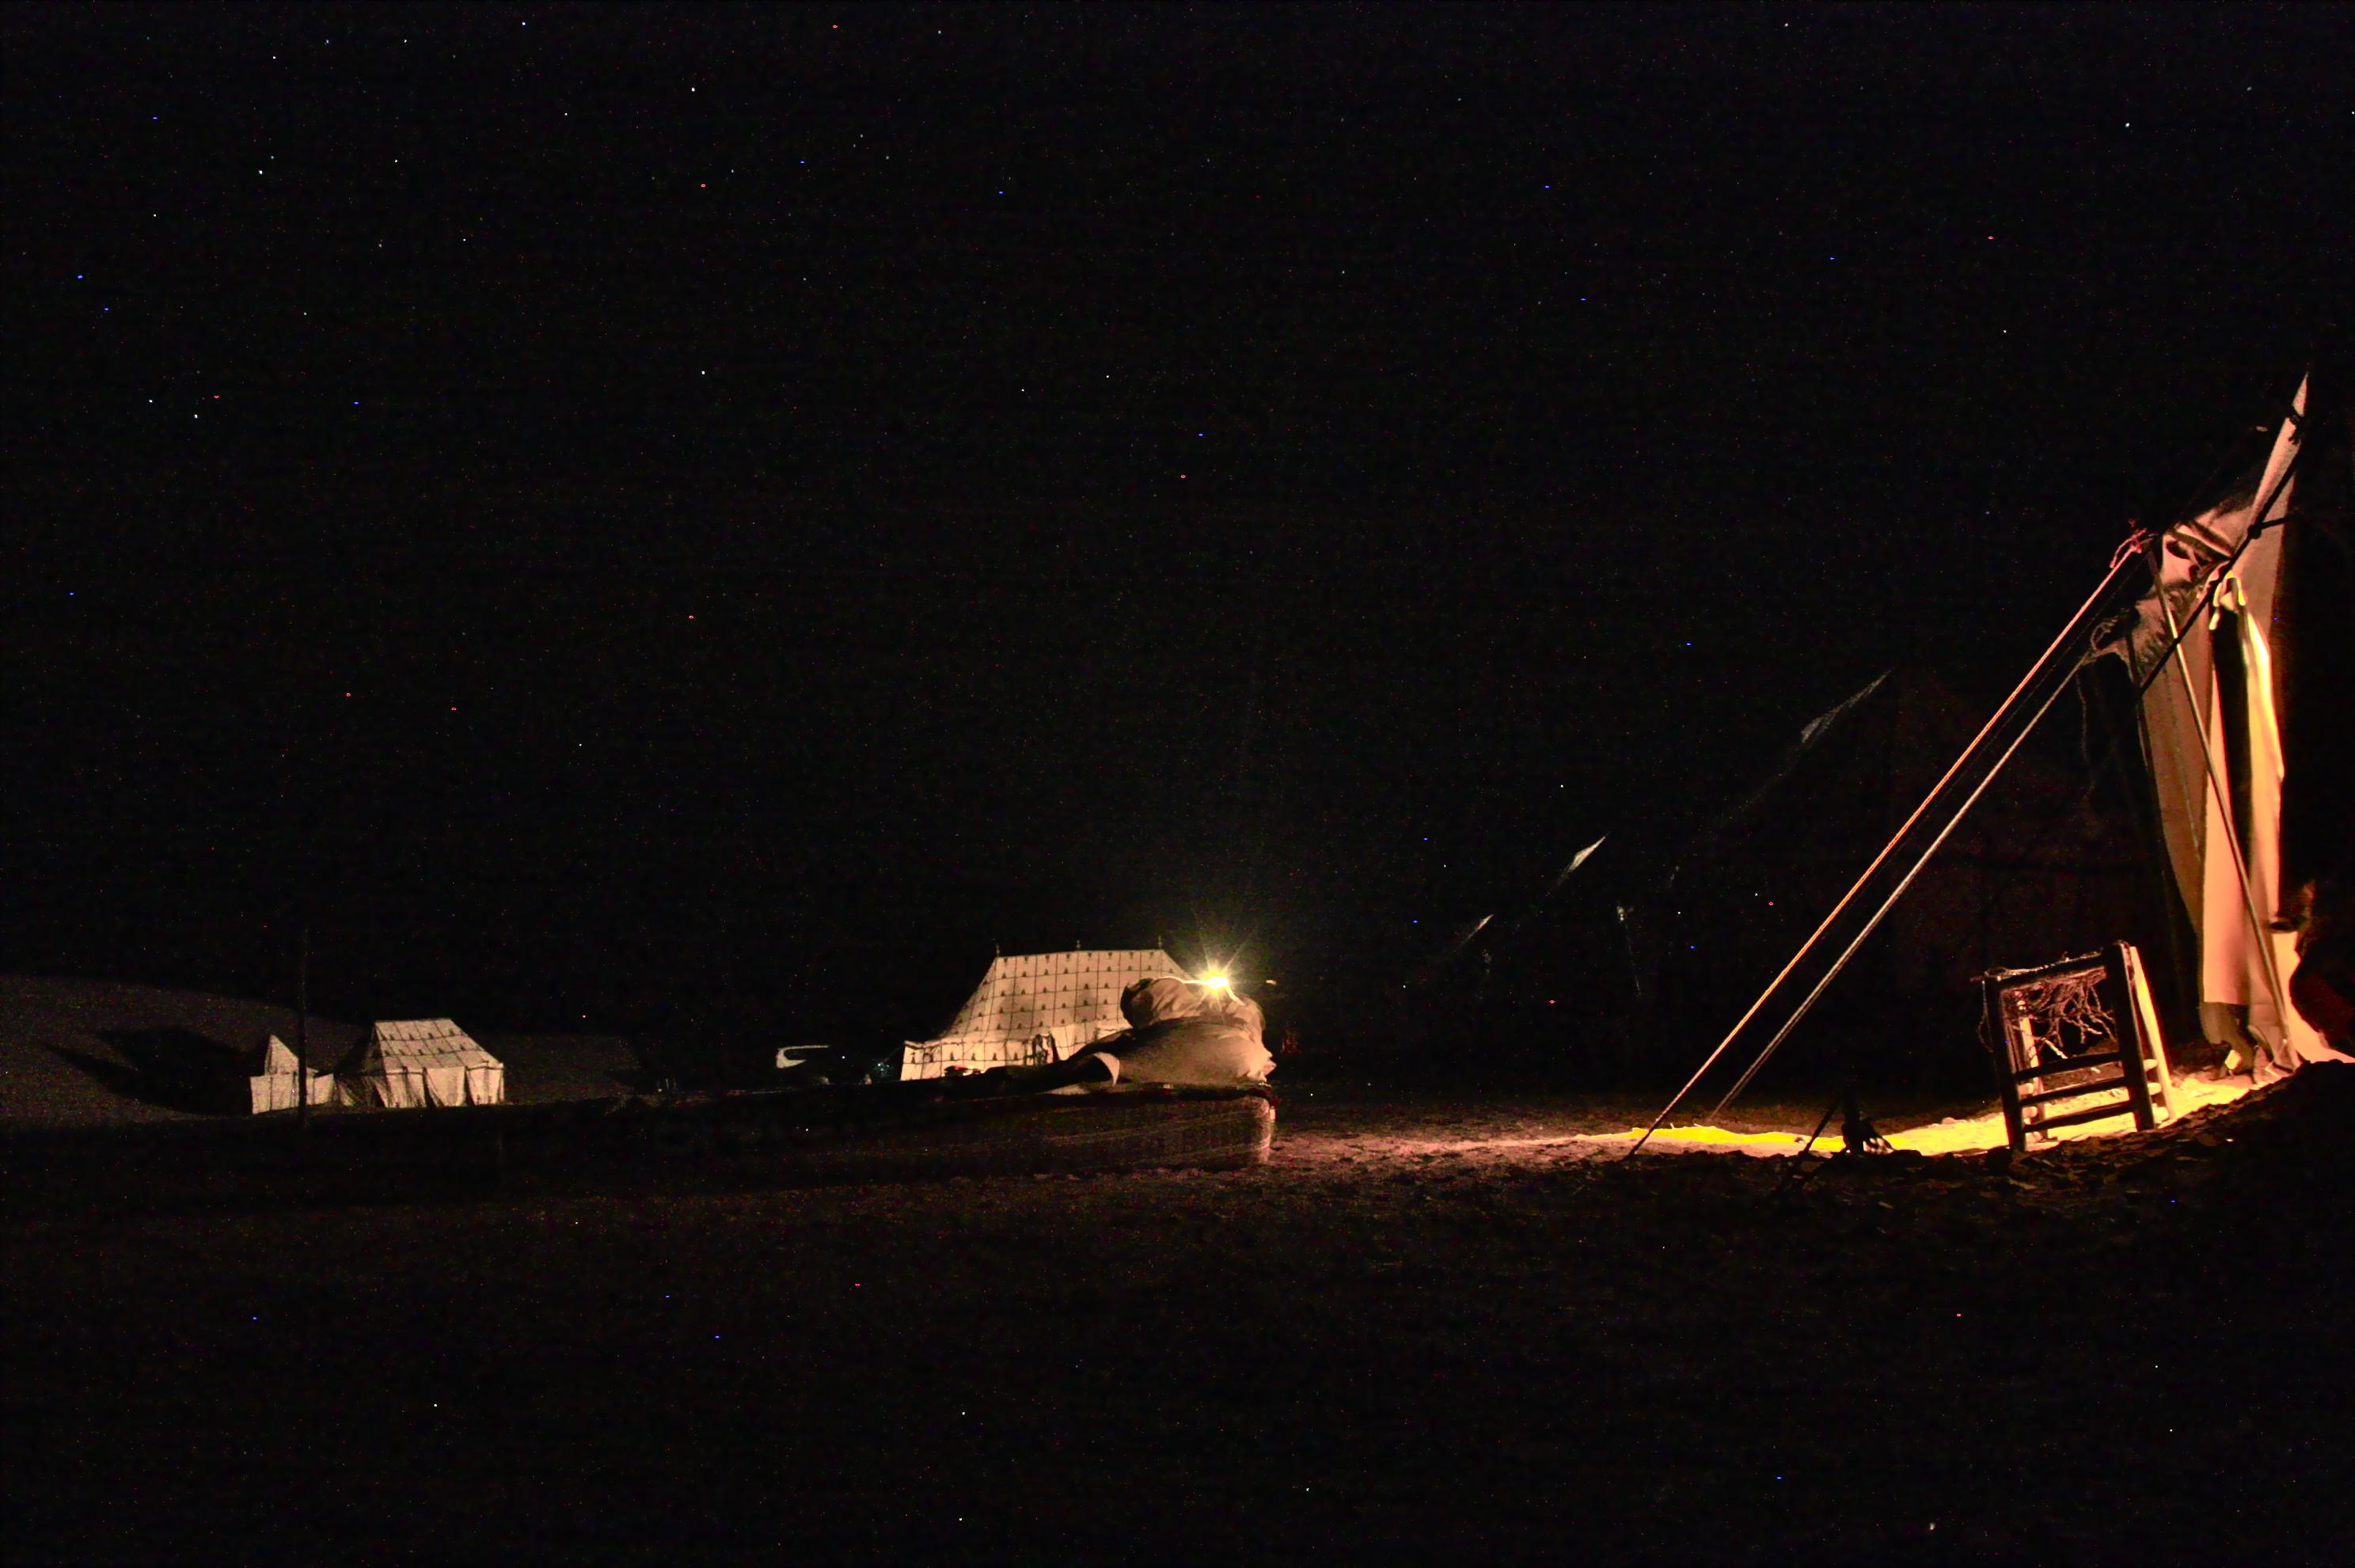 Sahara marokko yö